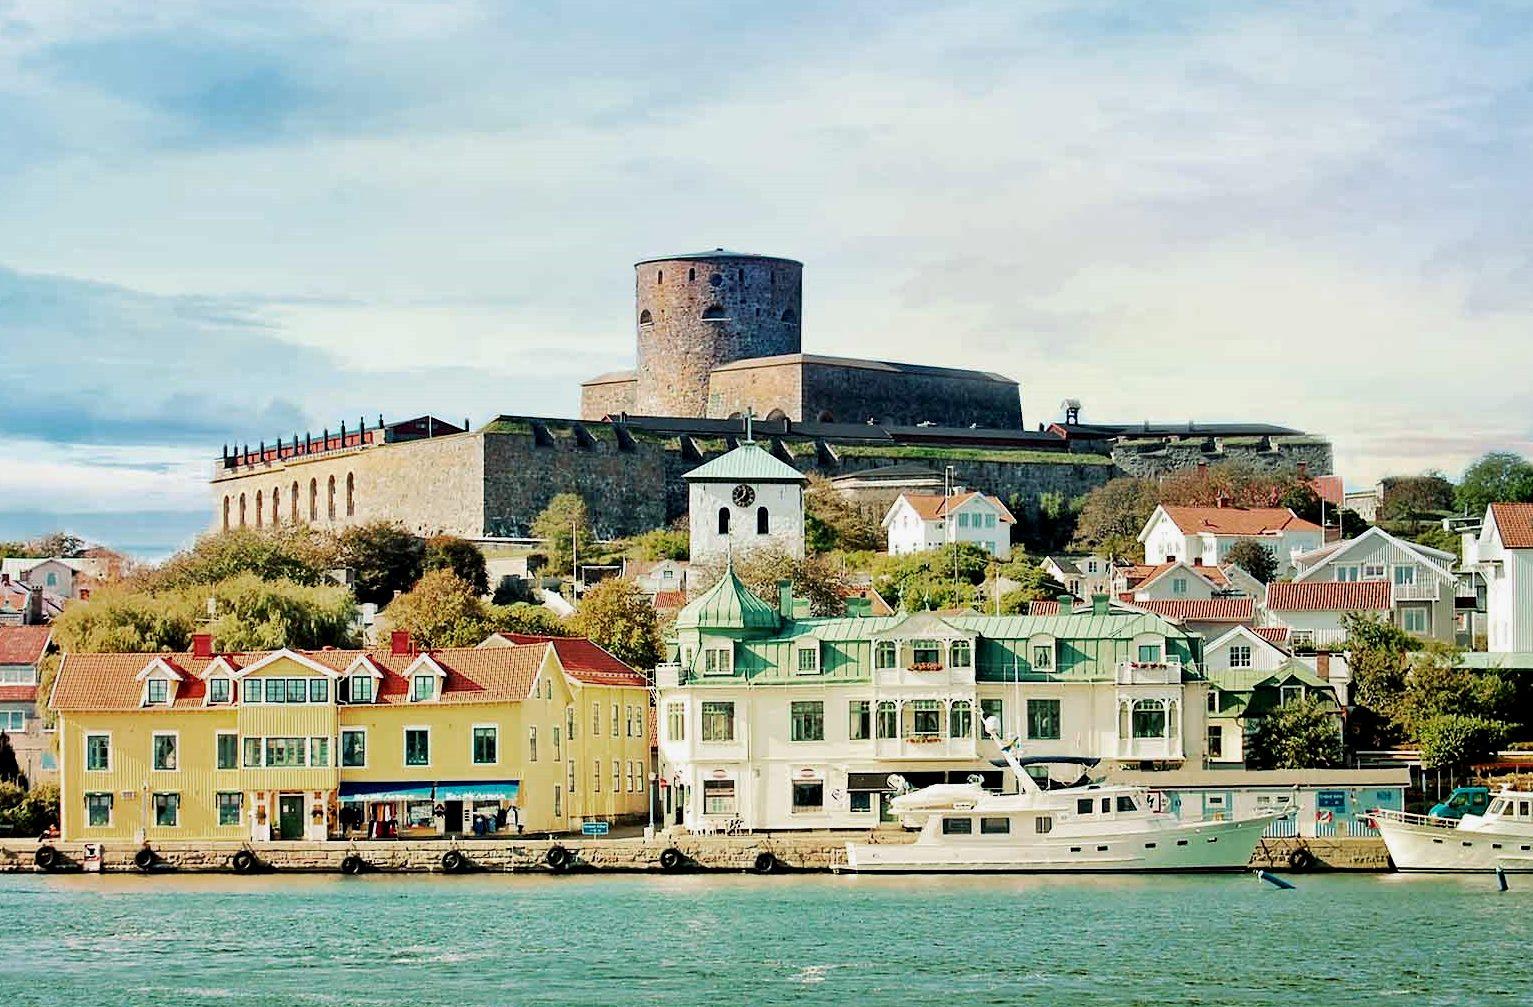 Марстранд, крепость Карлстен, Швеция